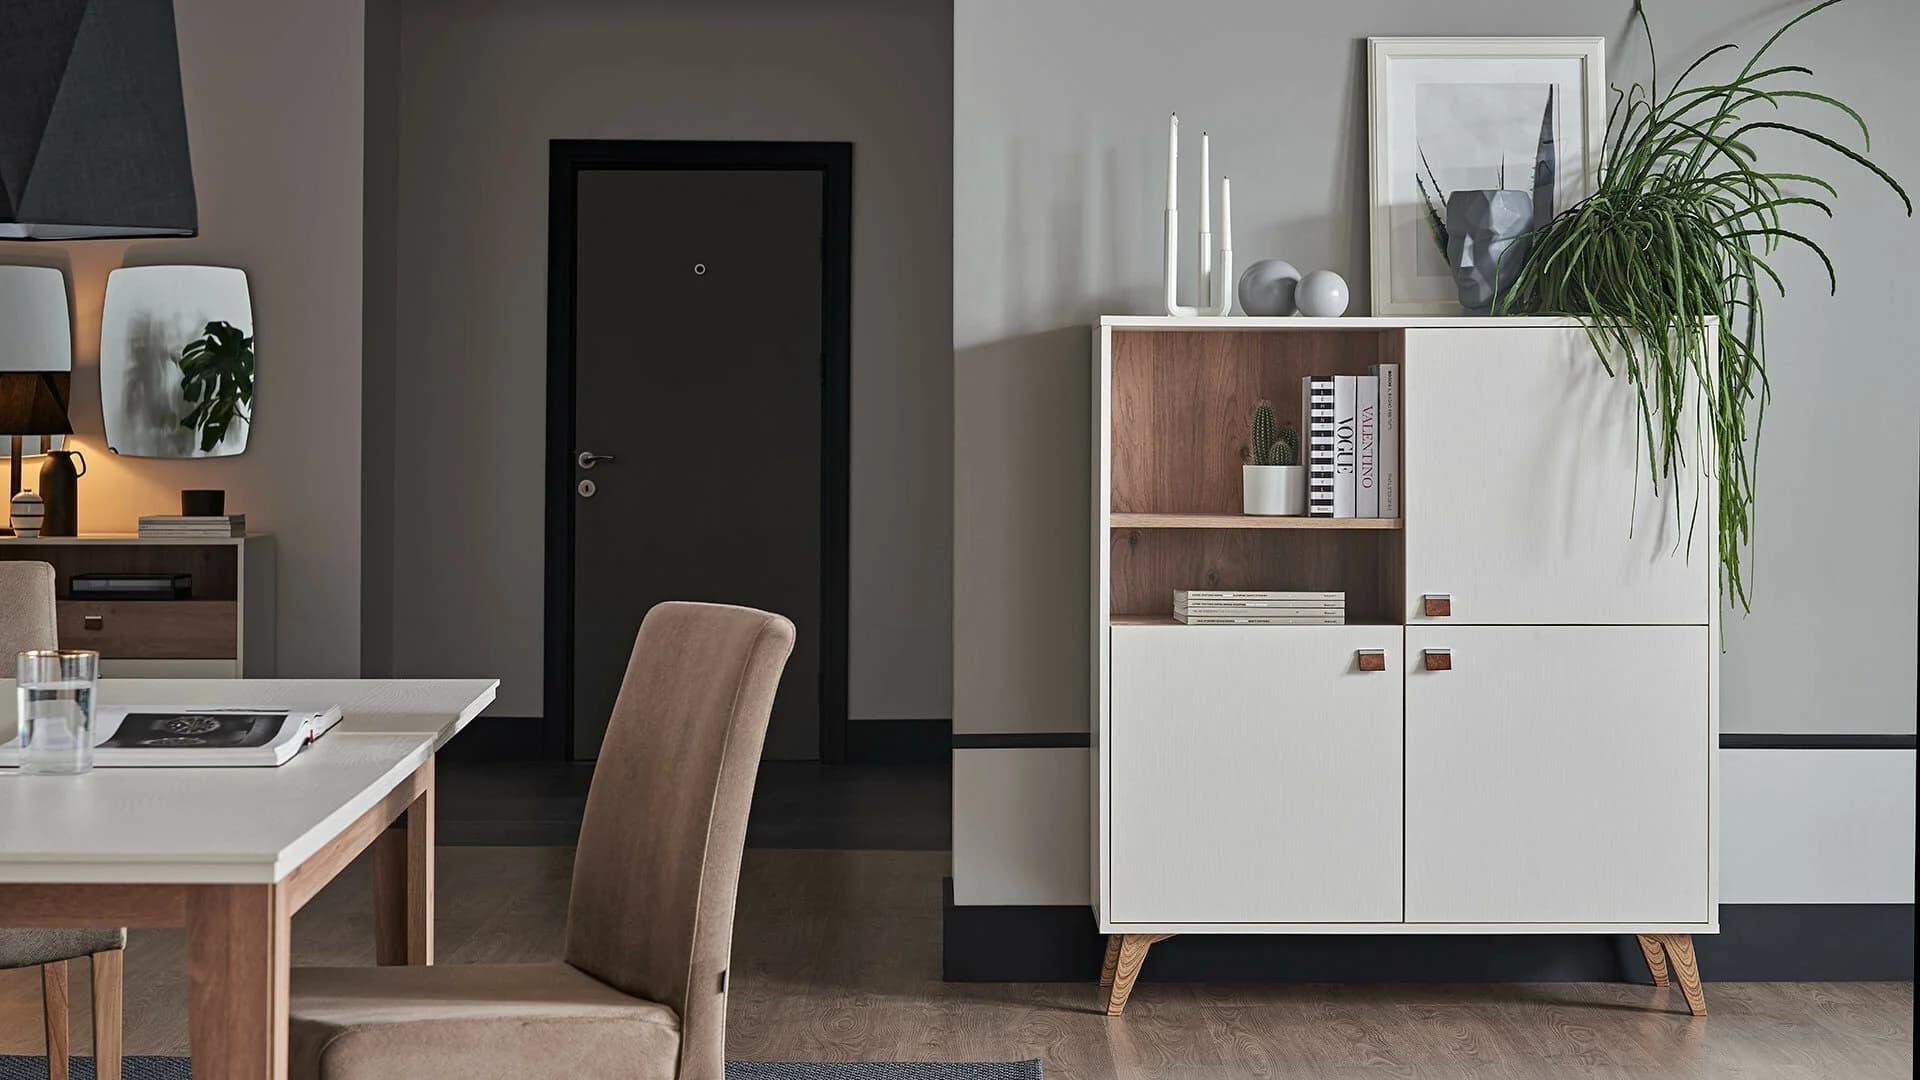 Cabinet din pal, cu 3 usi Mayer Alb / Stejar, l116,4xA44,5xH132,3 cm somproduct.ro